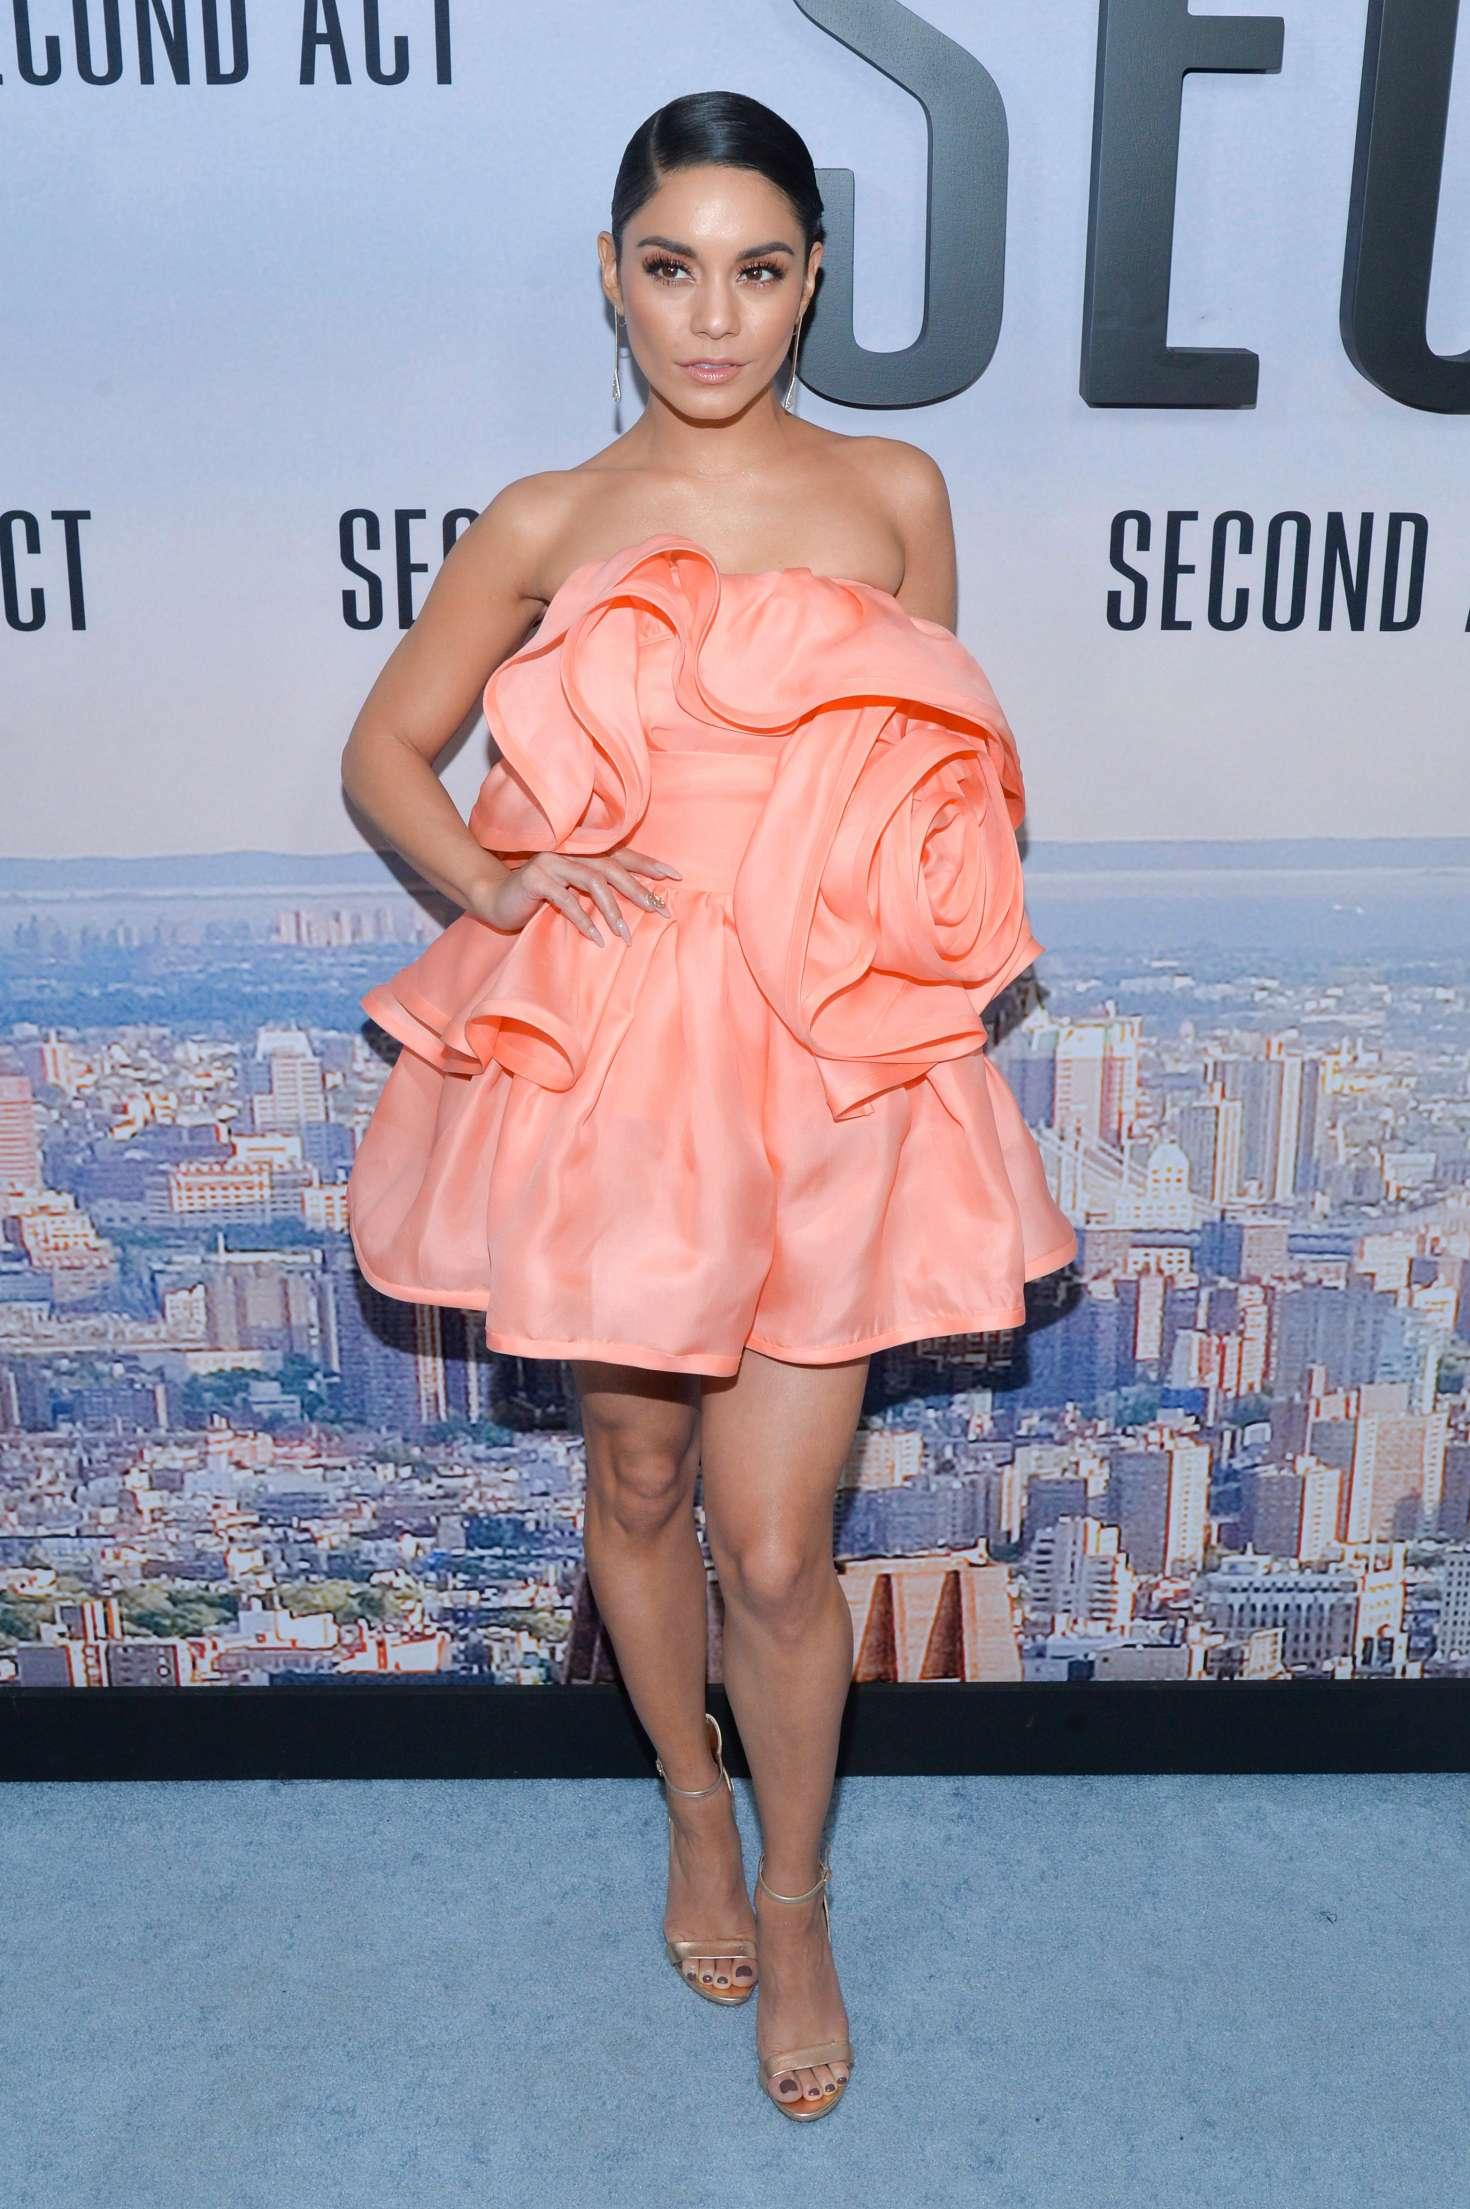 Vanessa Hudgens 2018 : Vanessa Hudgens: Second Act Premiere in NYC -05